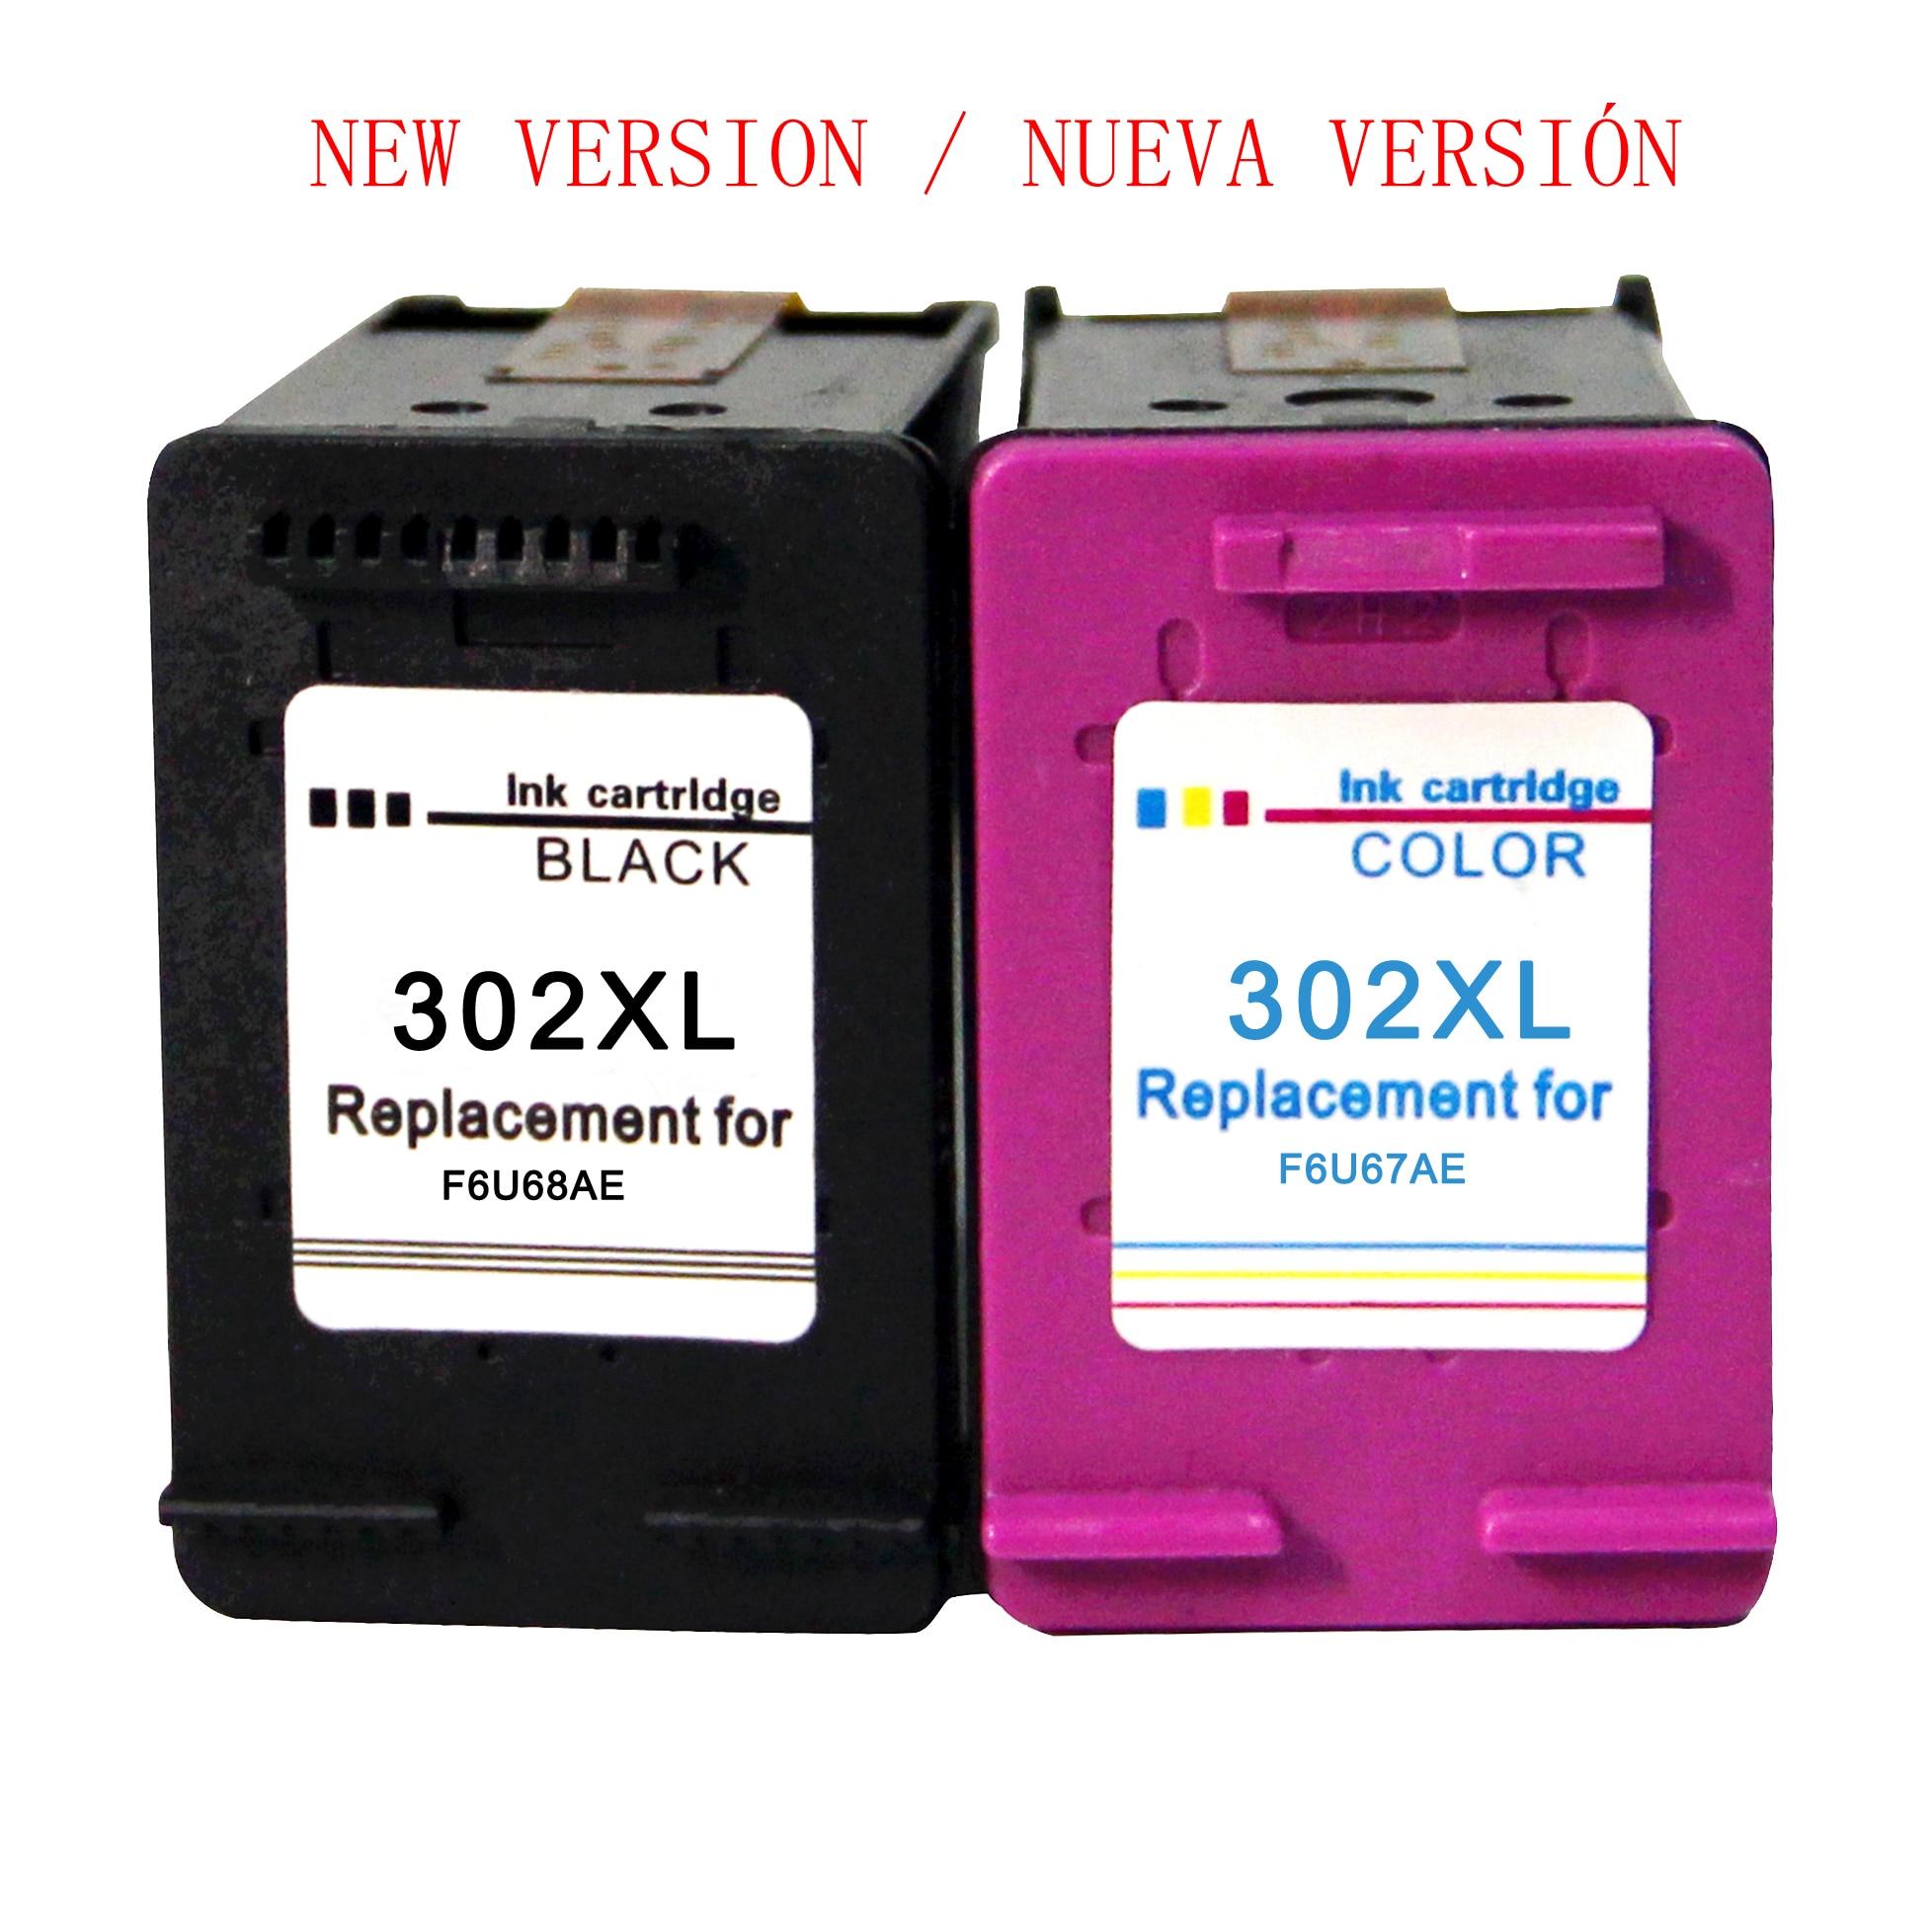 Kompatybilny 302XL wkłady atramentowe HP 302 dla HP OfficeJet 5220 5222 5230 5232 3831 3833 Envy 4520 4524 deskJet 3639